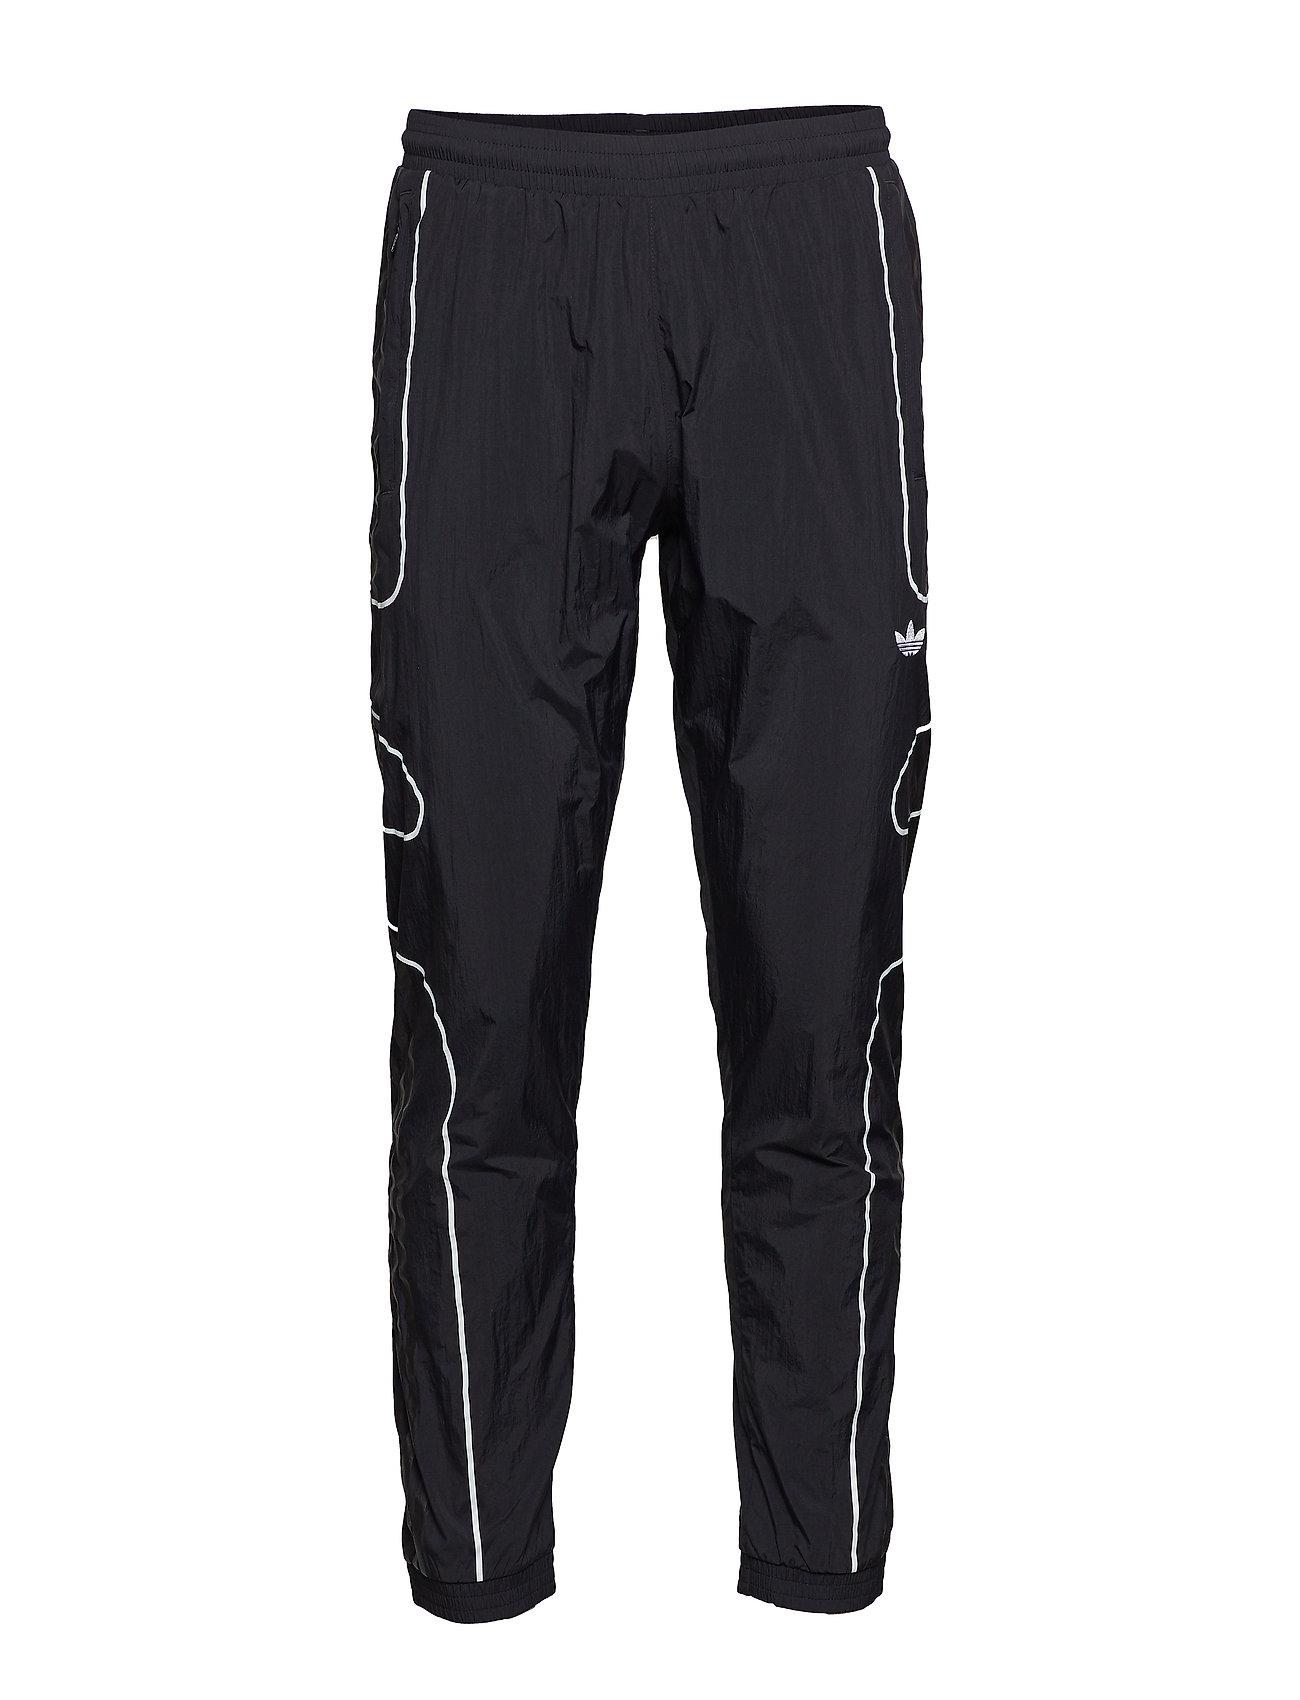 Recoger hojas incidente Simplificar  Flamestrk Wv Tp (Black) (£38.97) - adidas Originals - | Boozt.com